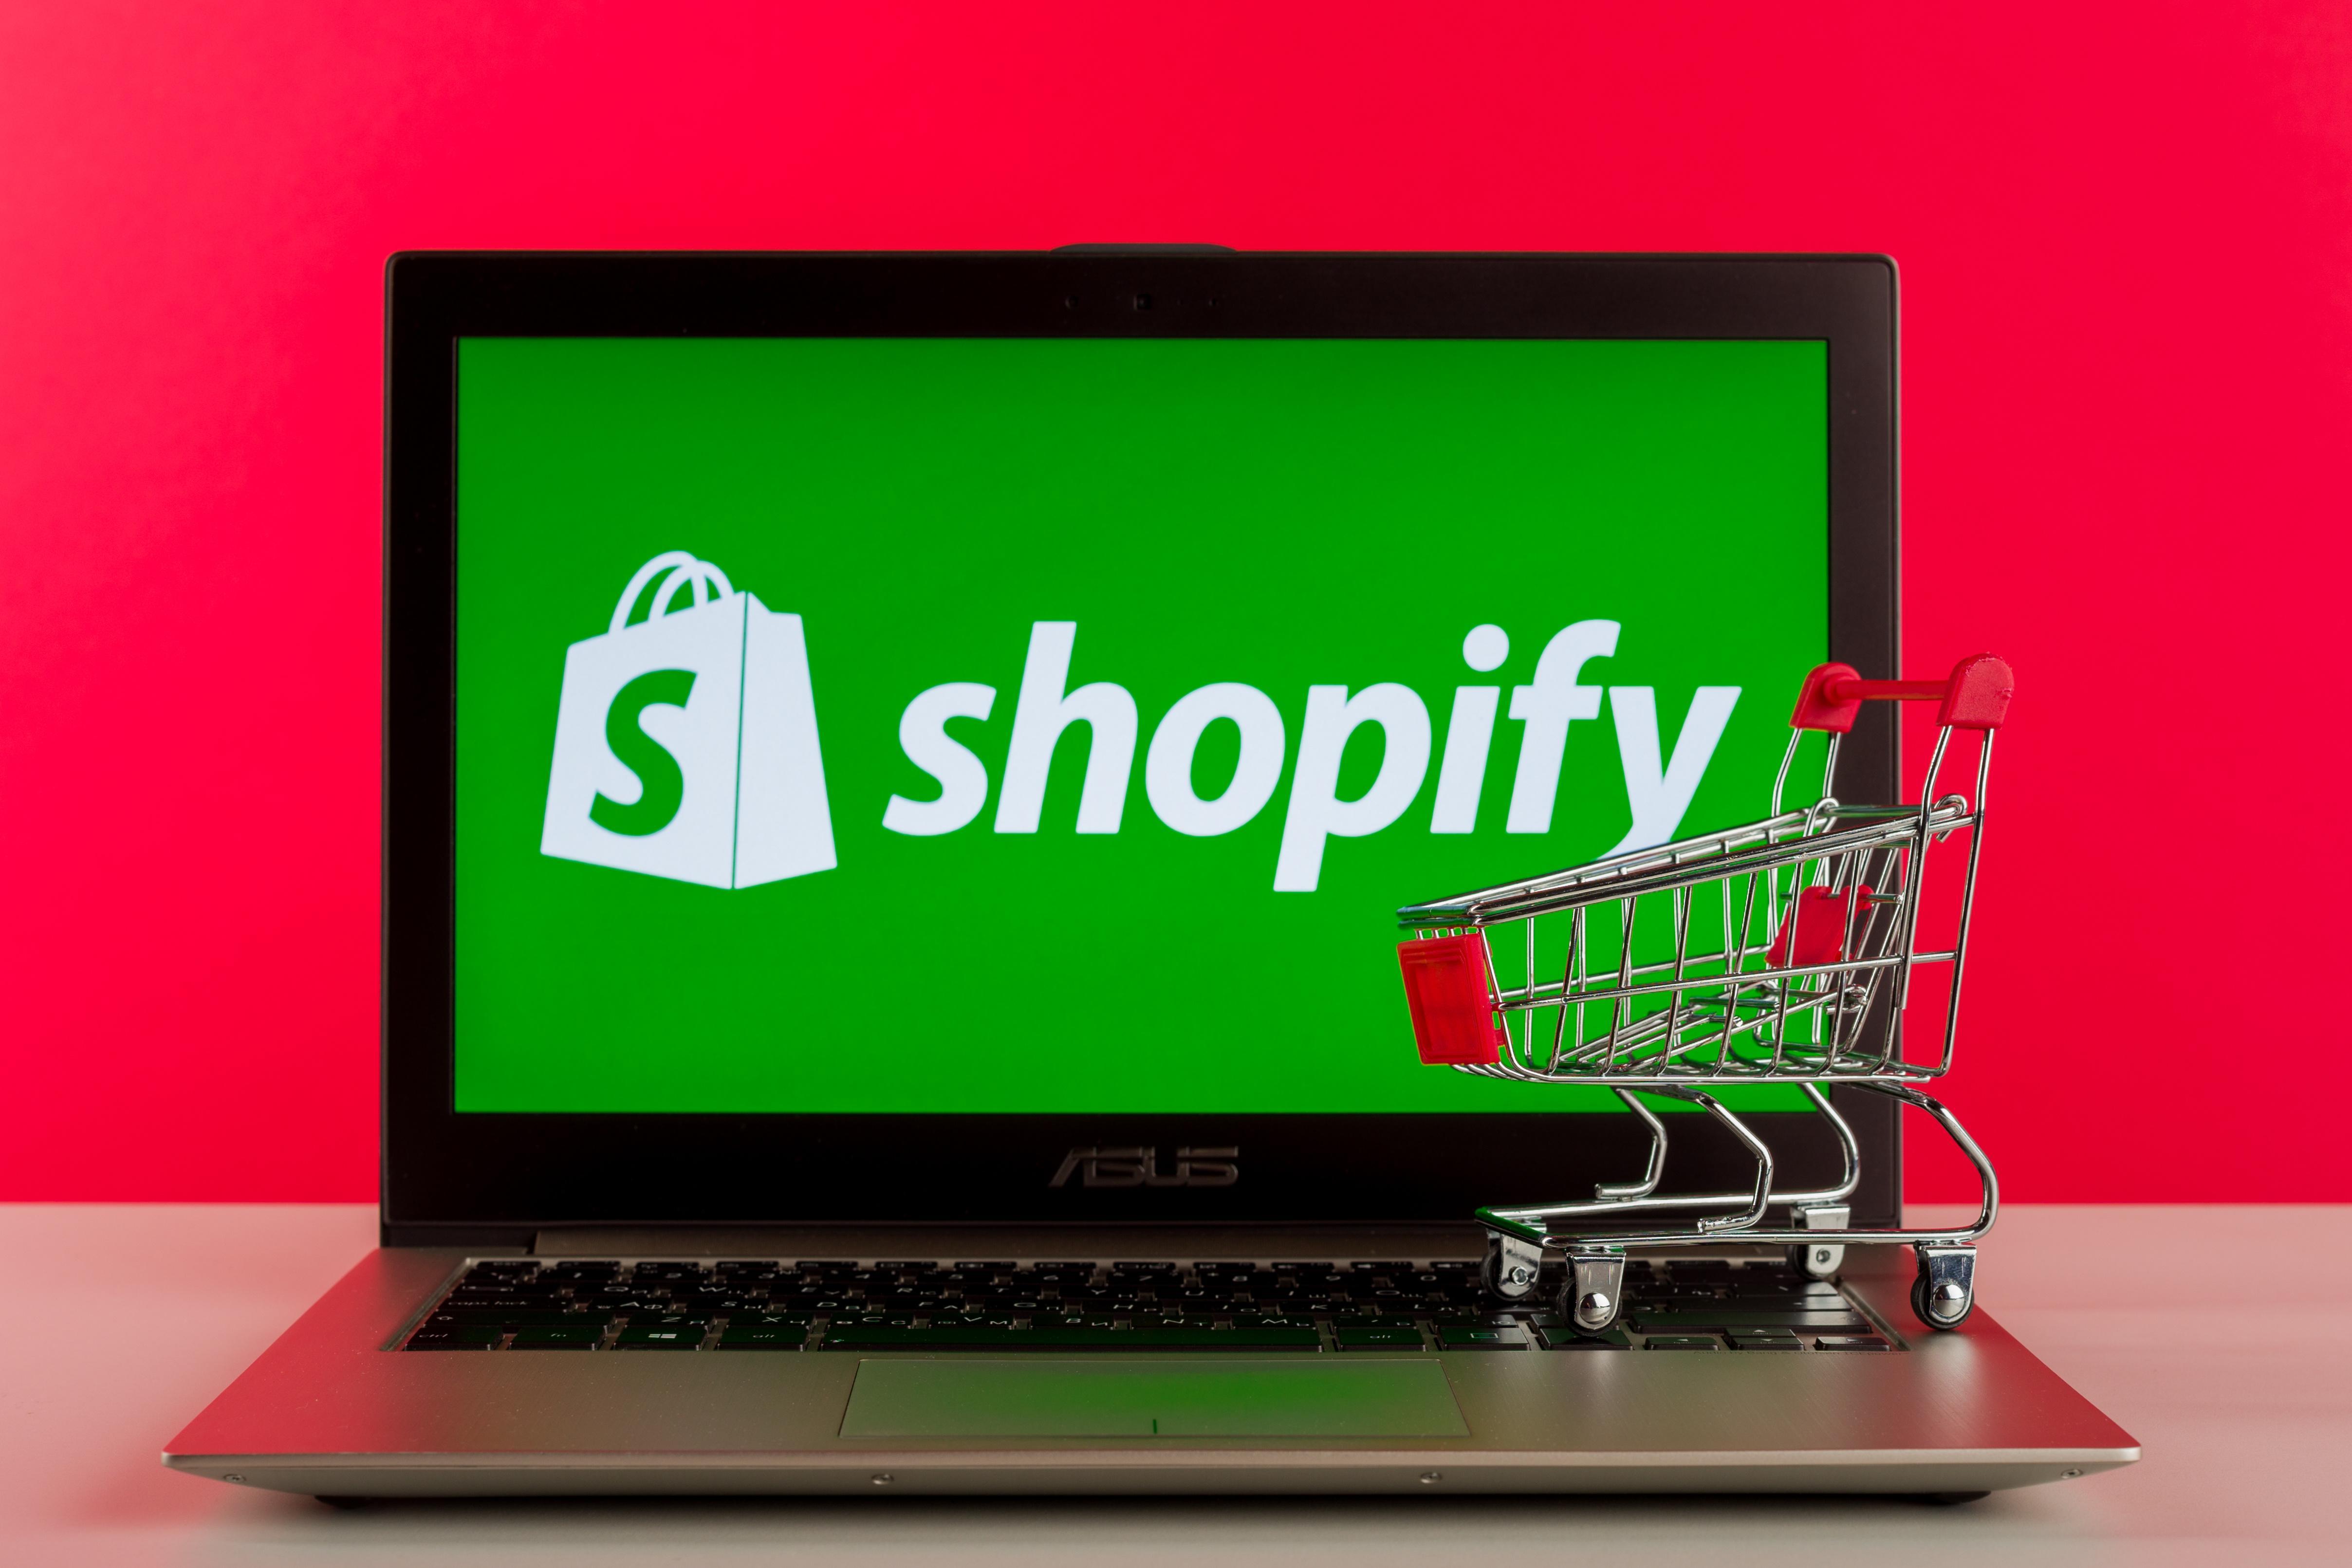 uploads///Shopify stock